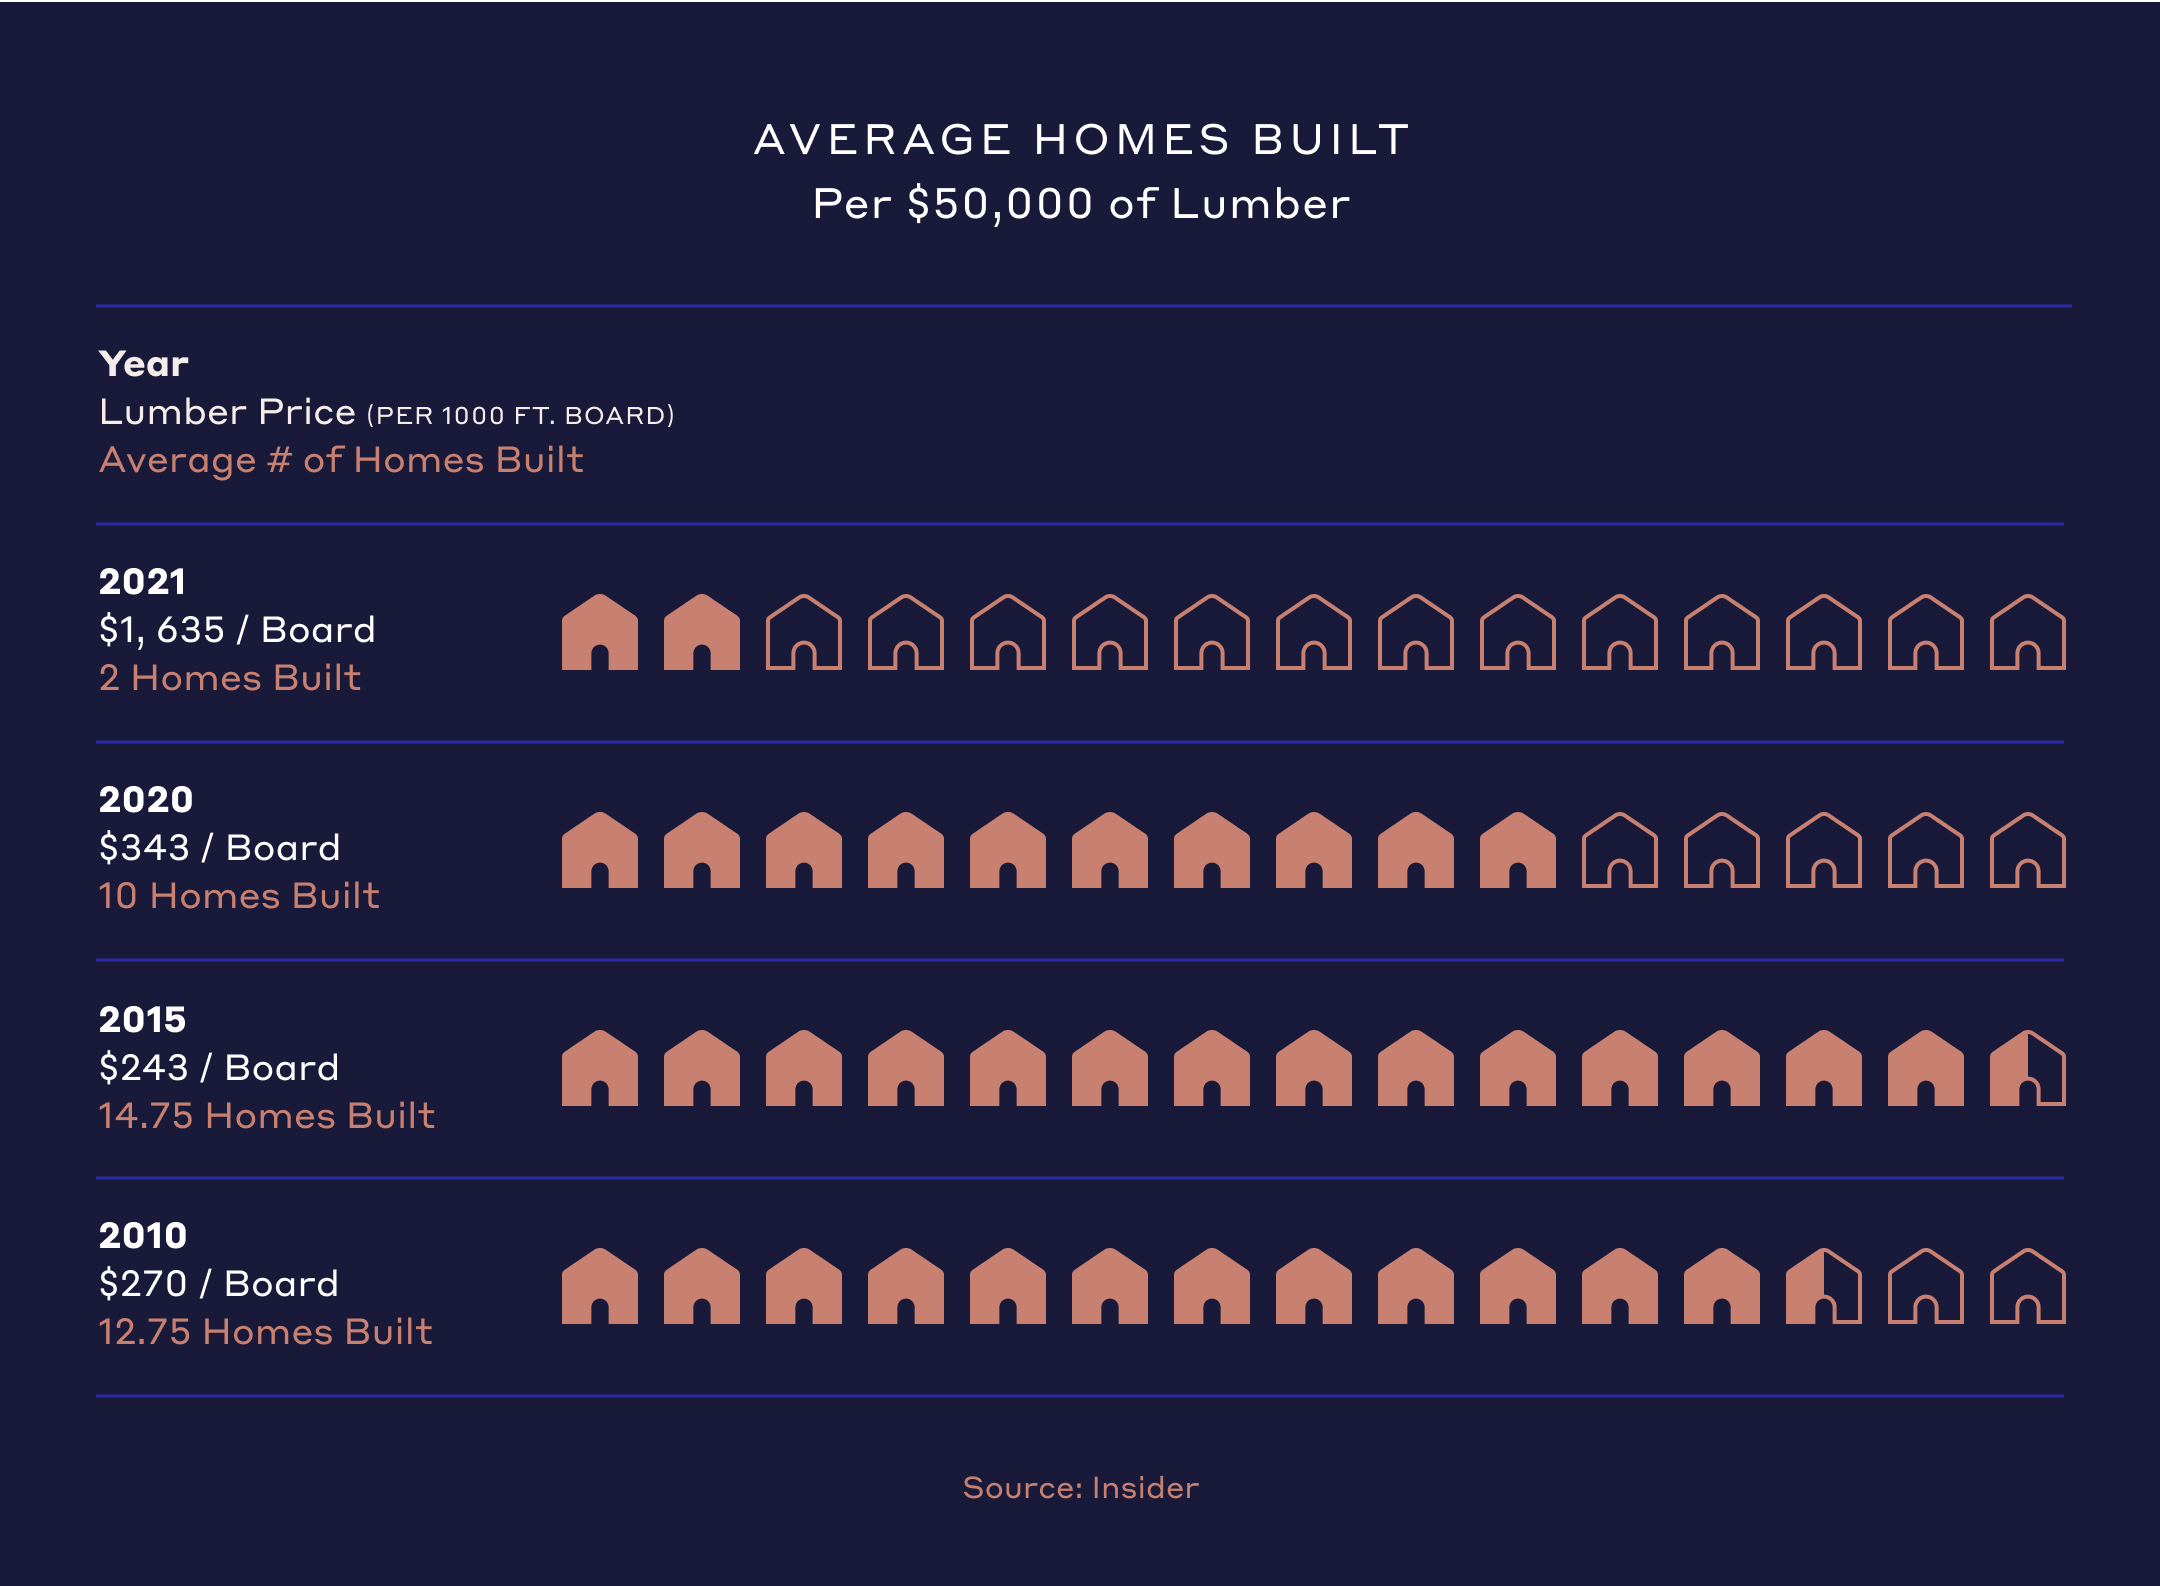 Average Homes Built per 50k$ of lumber